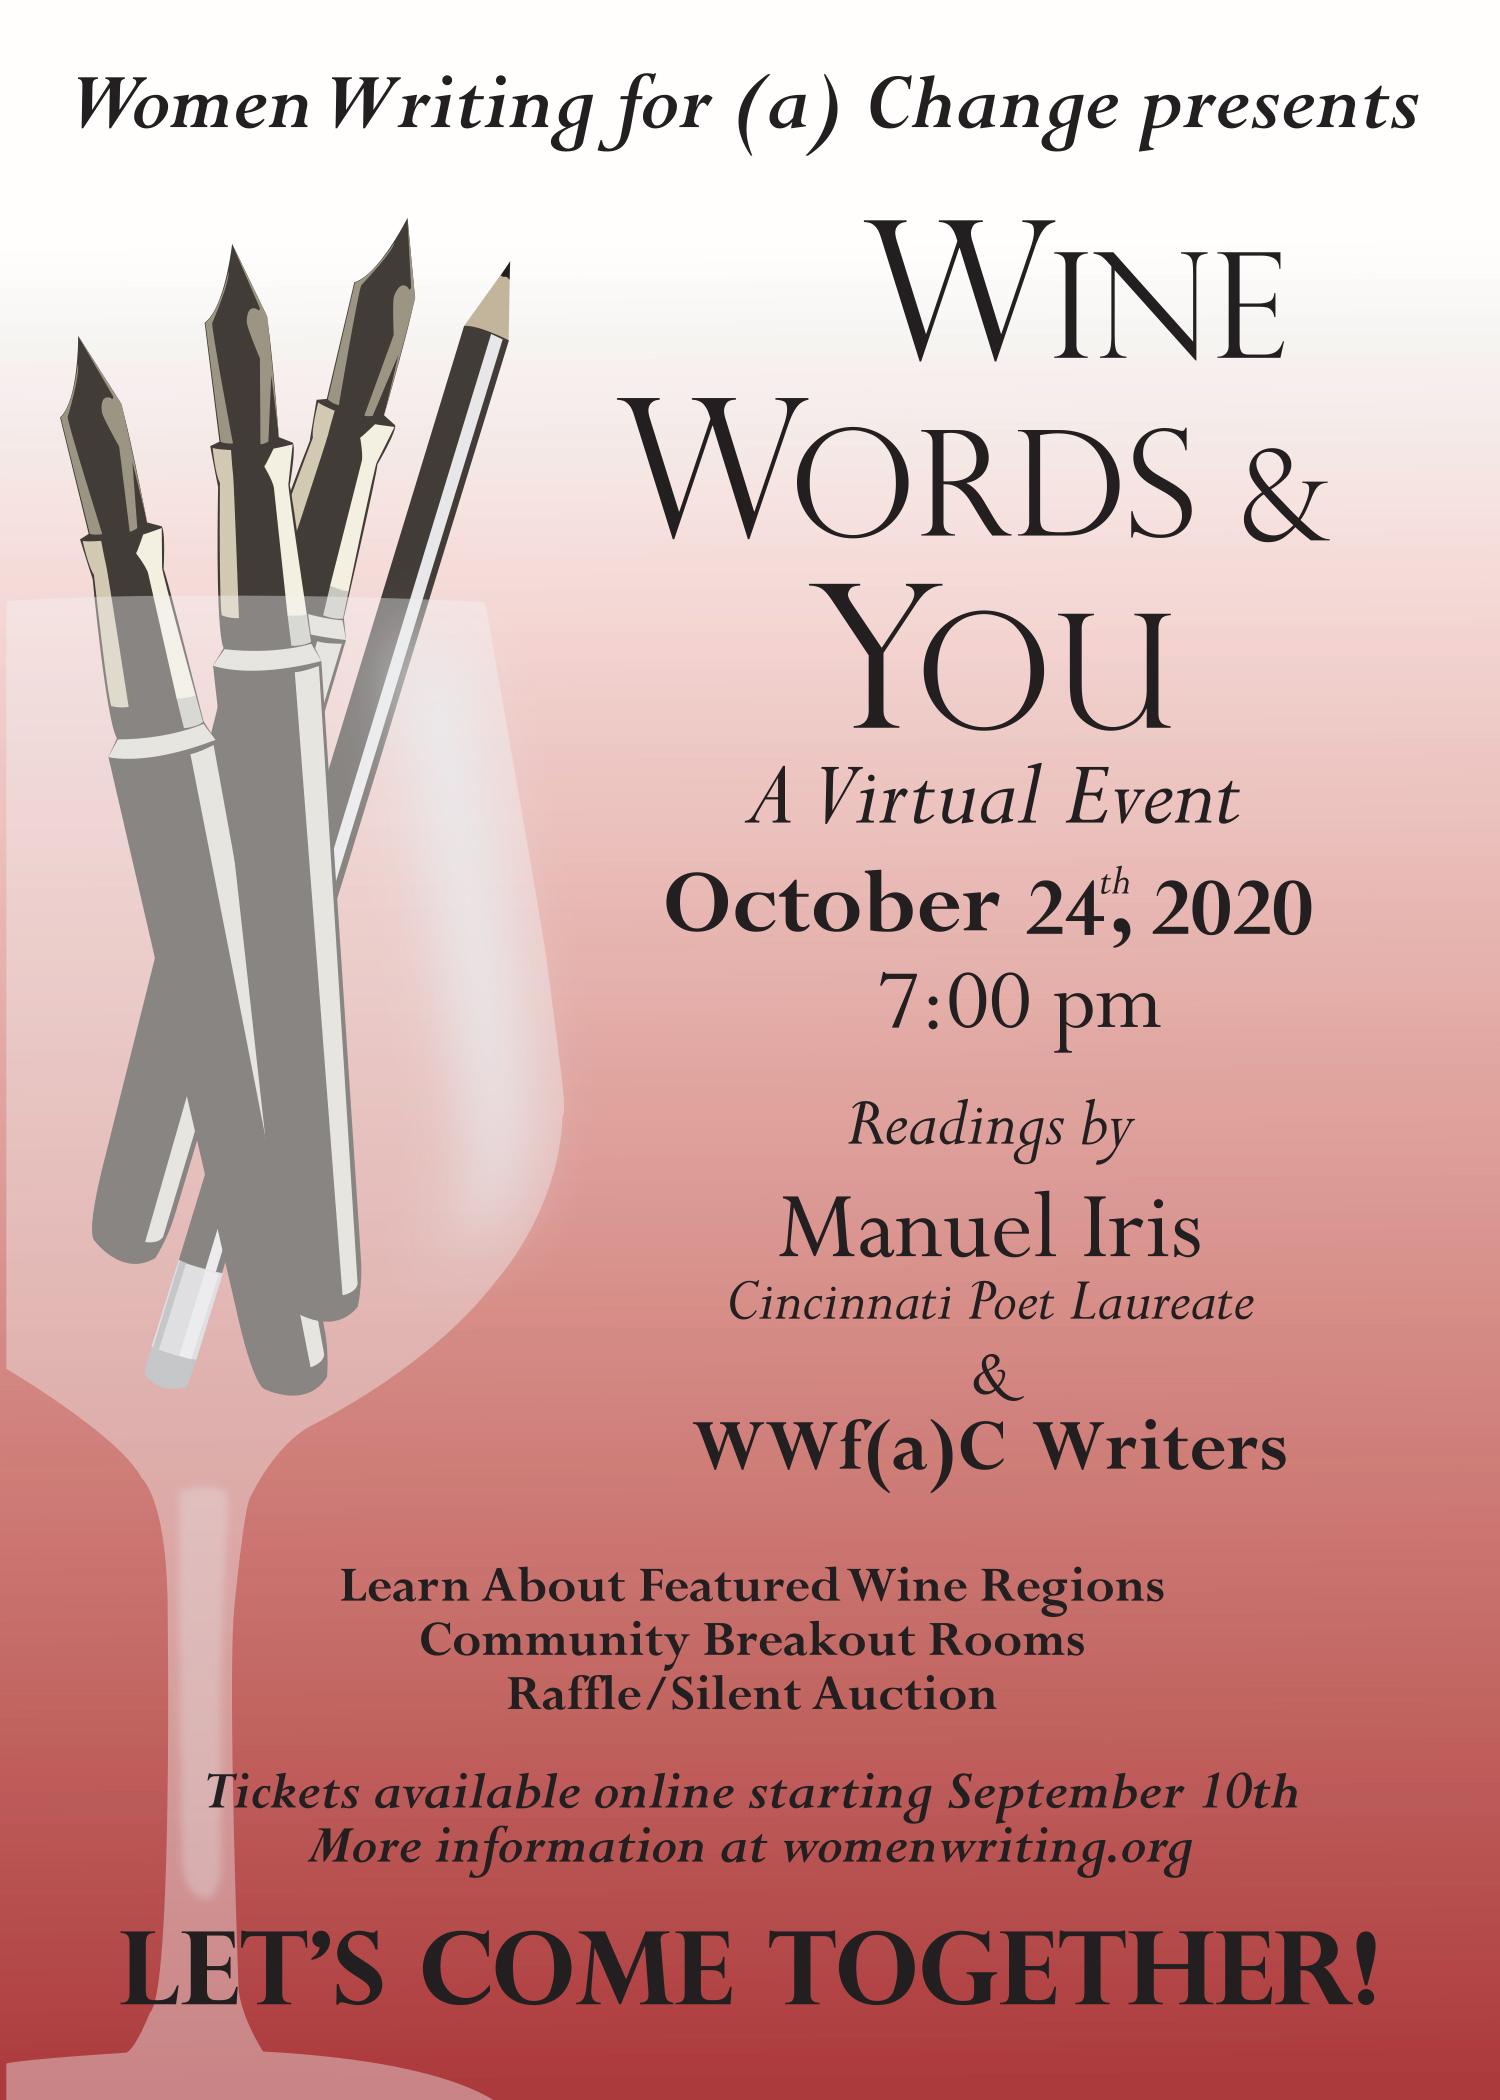 Wine, Words & You Invitation Image